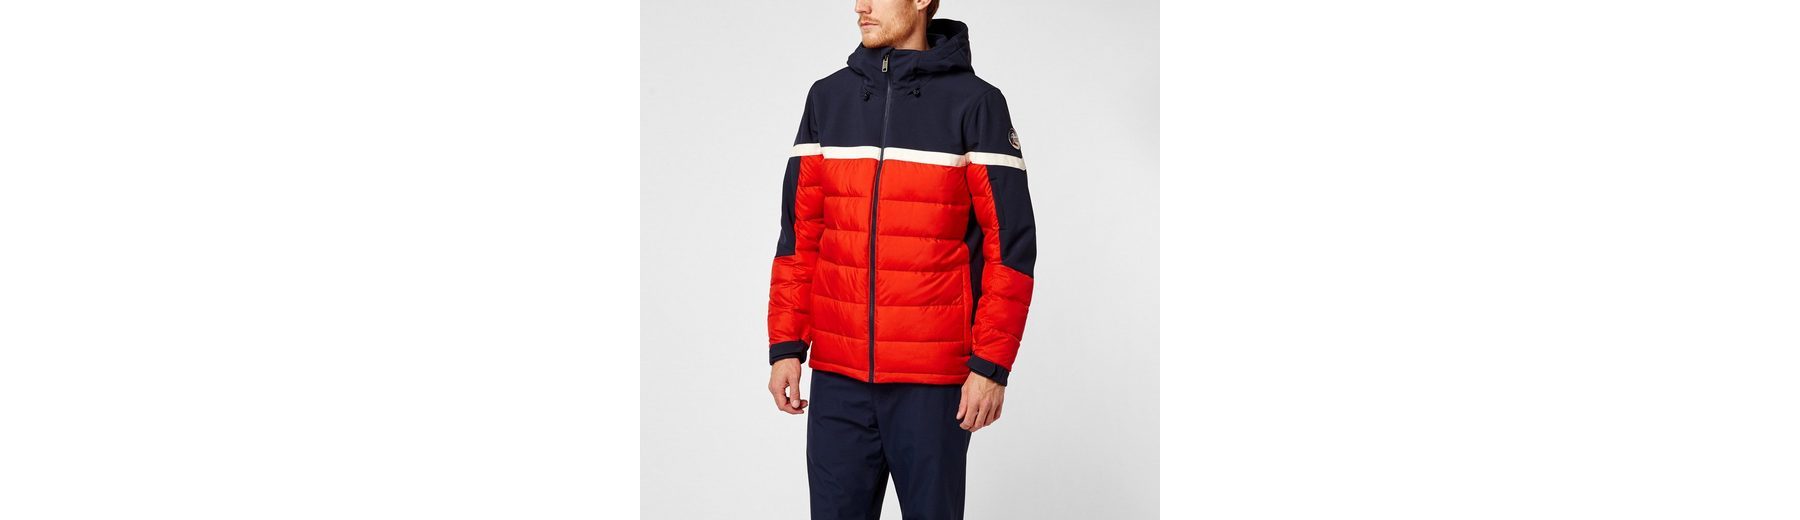 O'Neill Wintersportjacke Retro Ski Am Billigsten Billig Größte Lieferant IALCq99wA